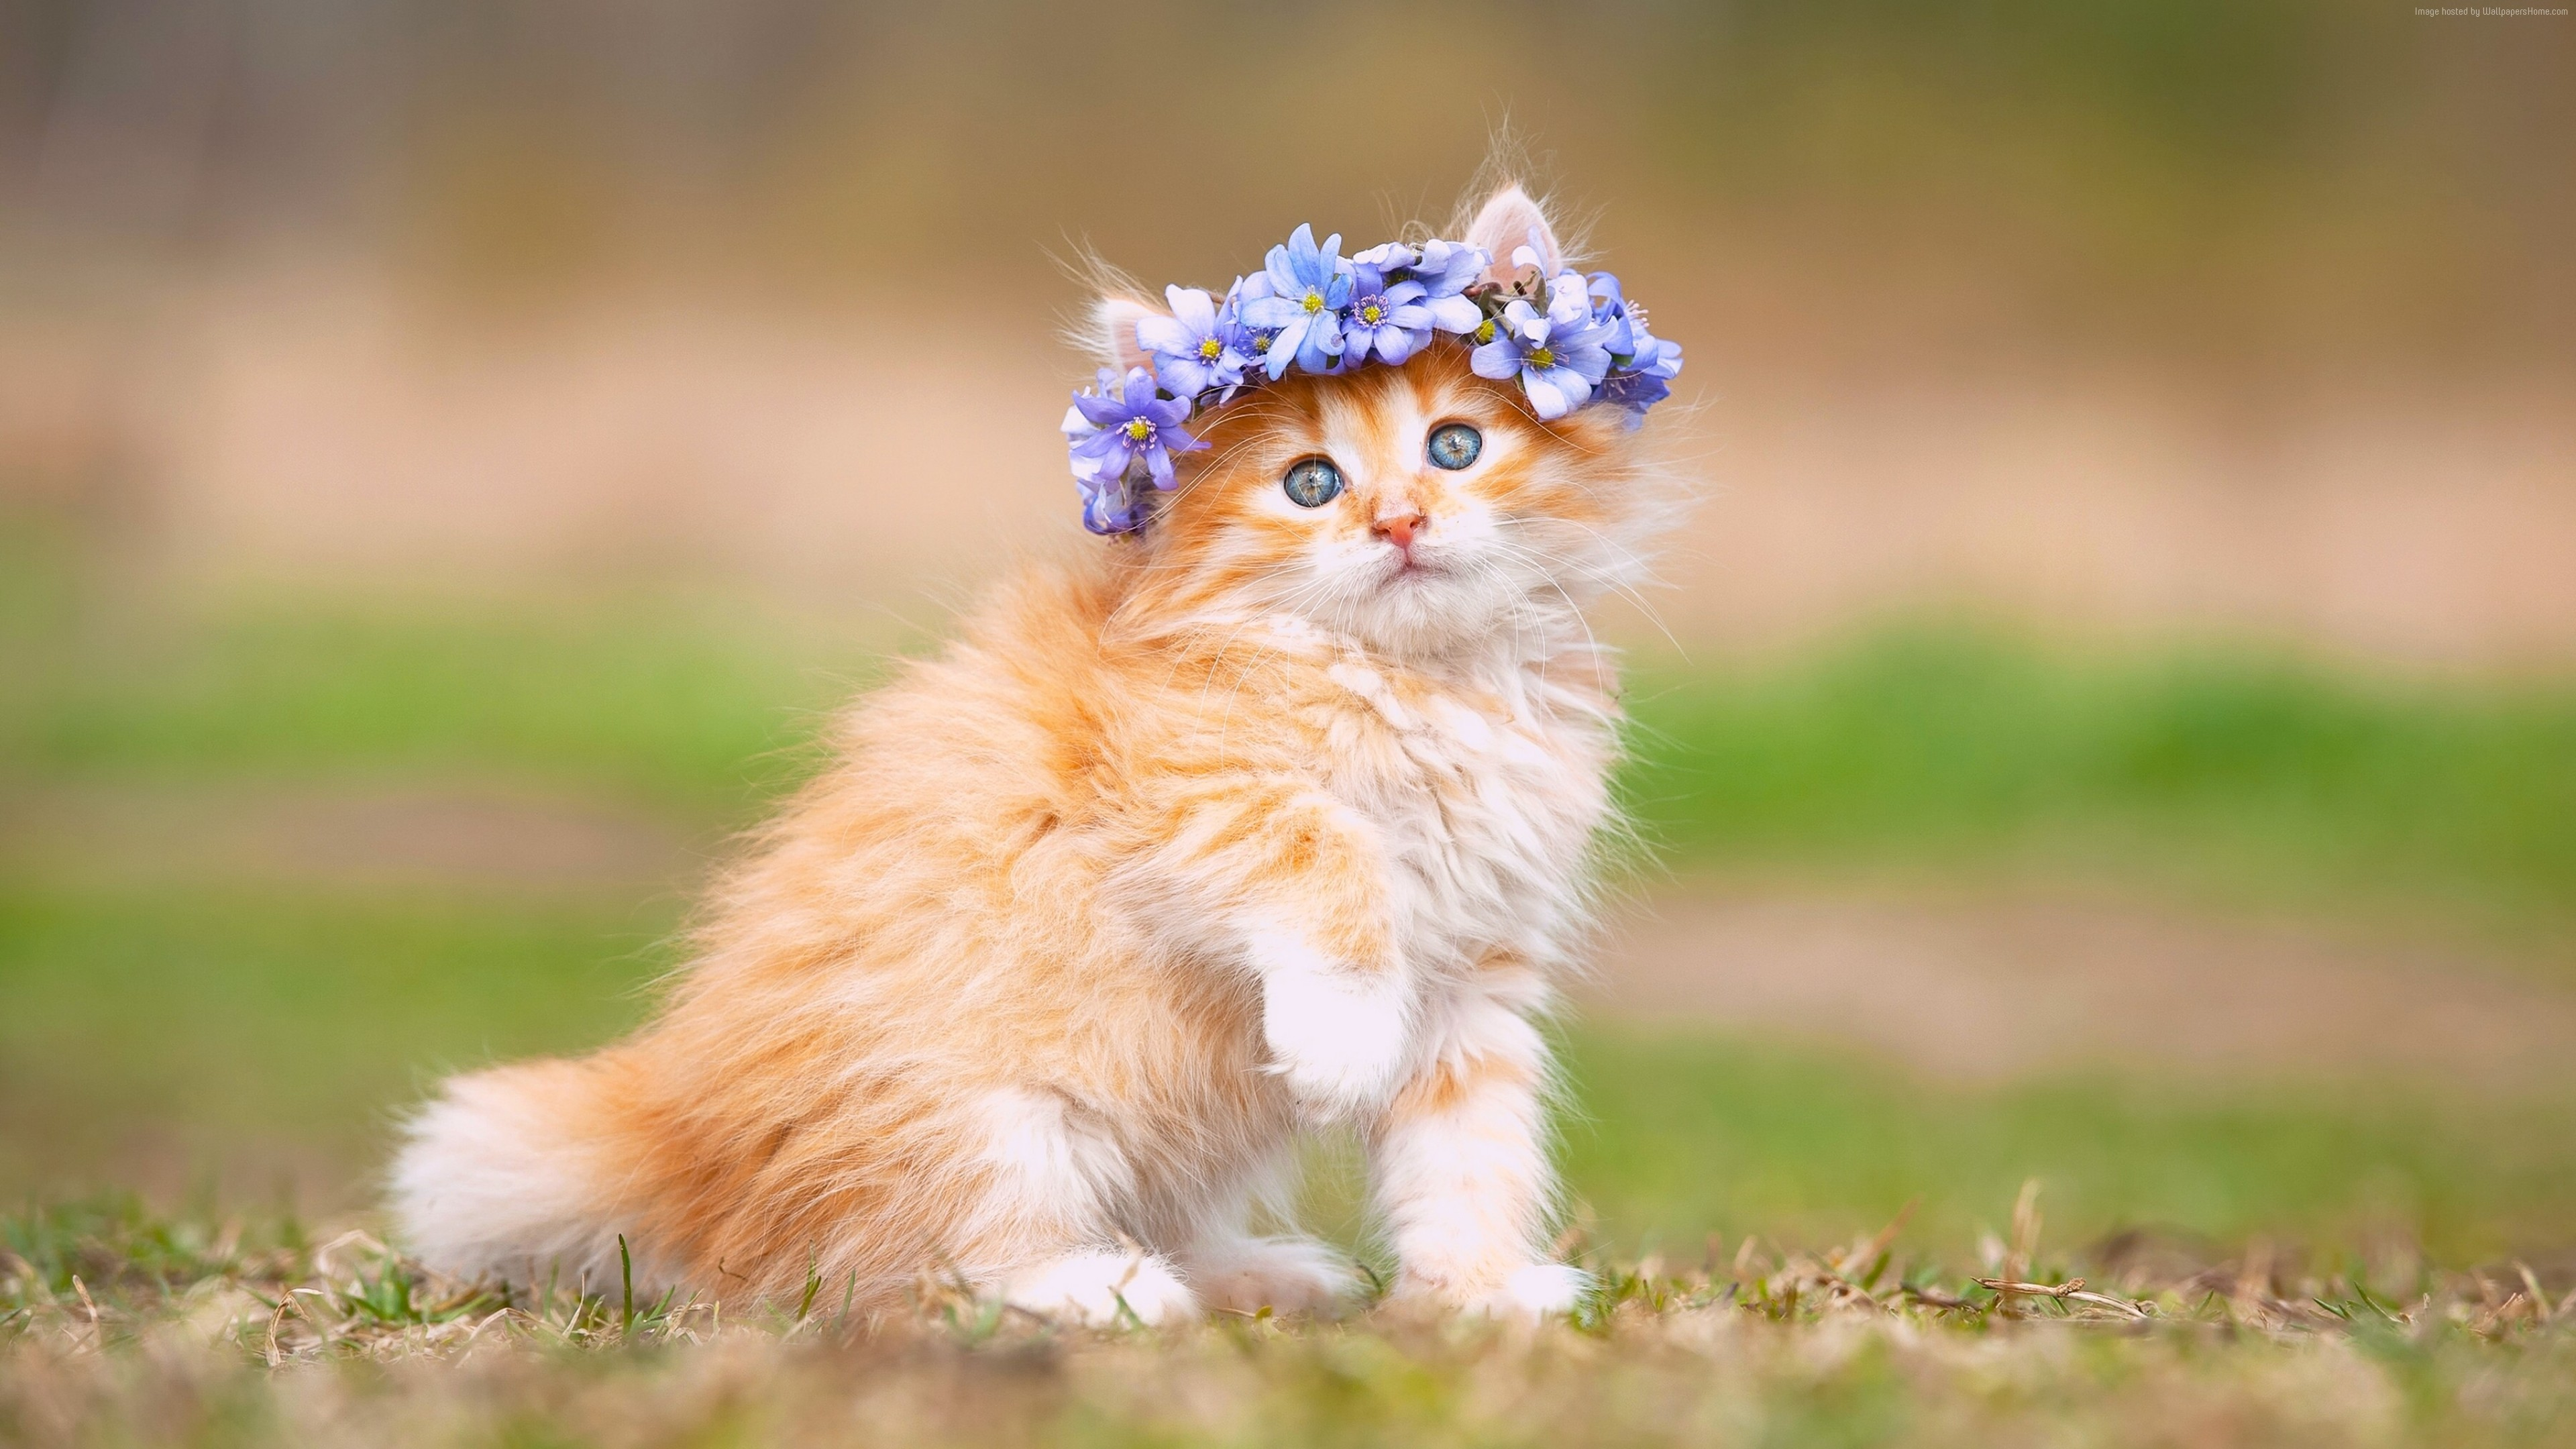 Wallpaper kitten cute animals 4k Animals Wallpaper Download 3840x2160